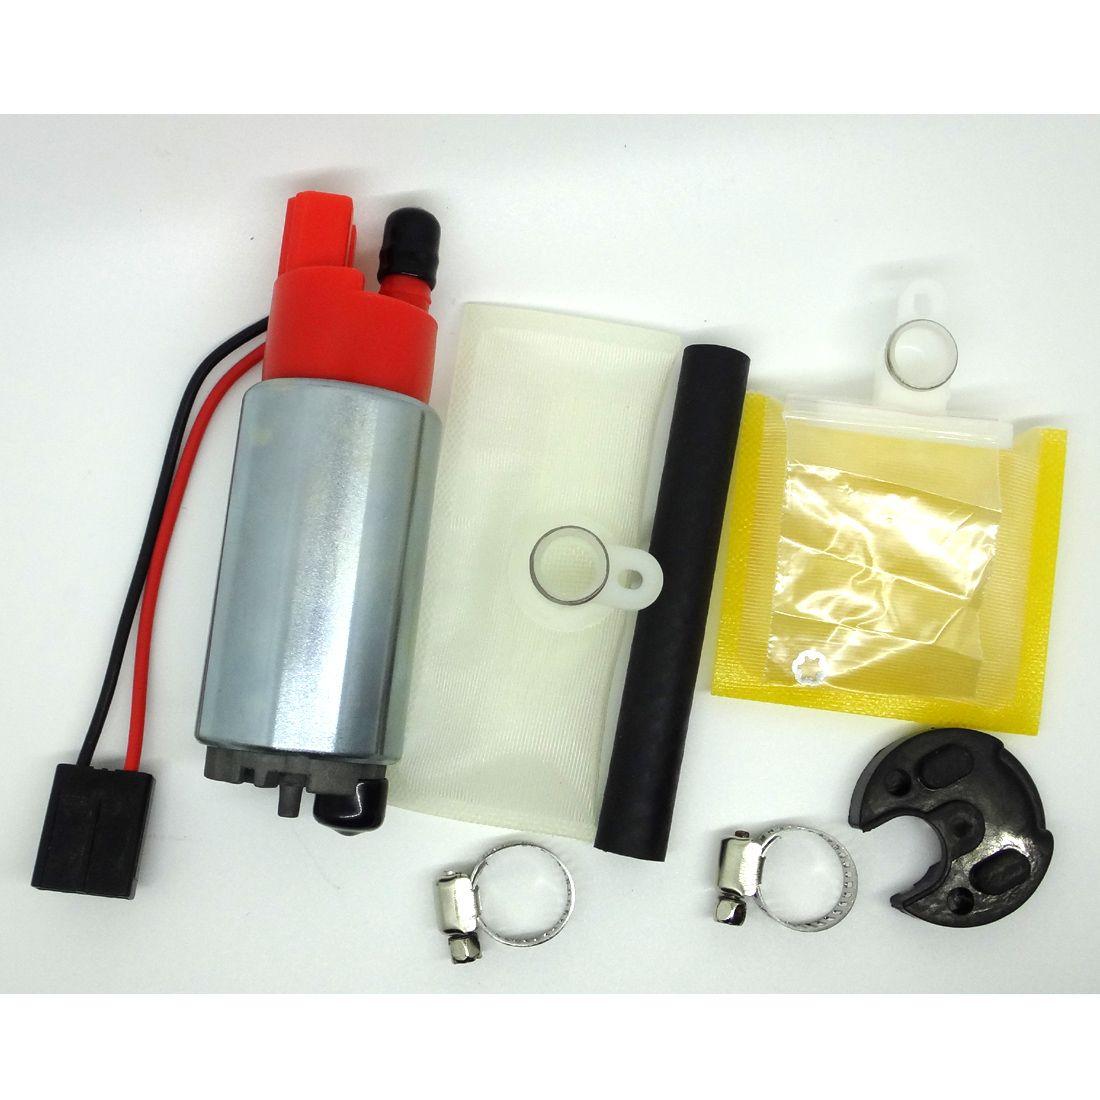 Lifetime Warrany New OEM Replacement EFI Fuel Pump & Install Kit 07-ADD 1999 Nis -San Altima